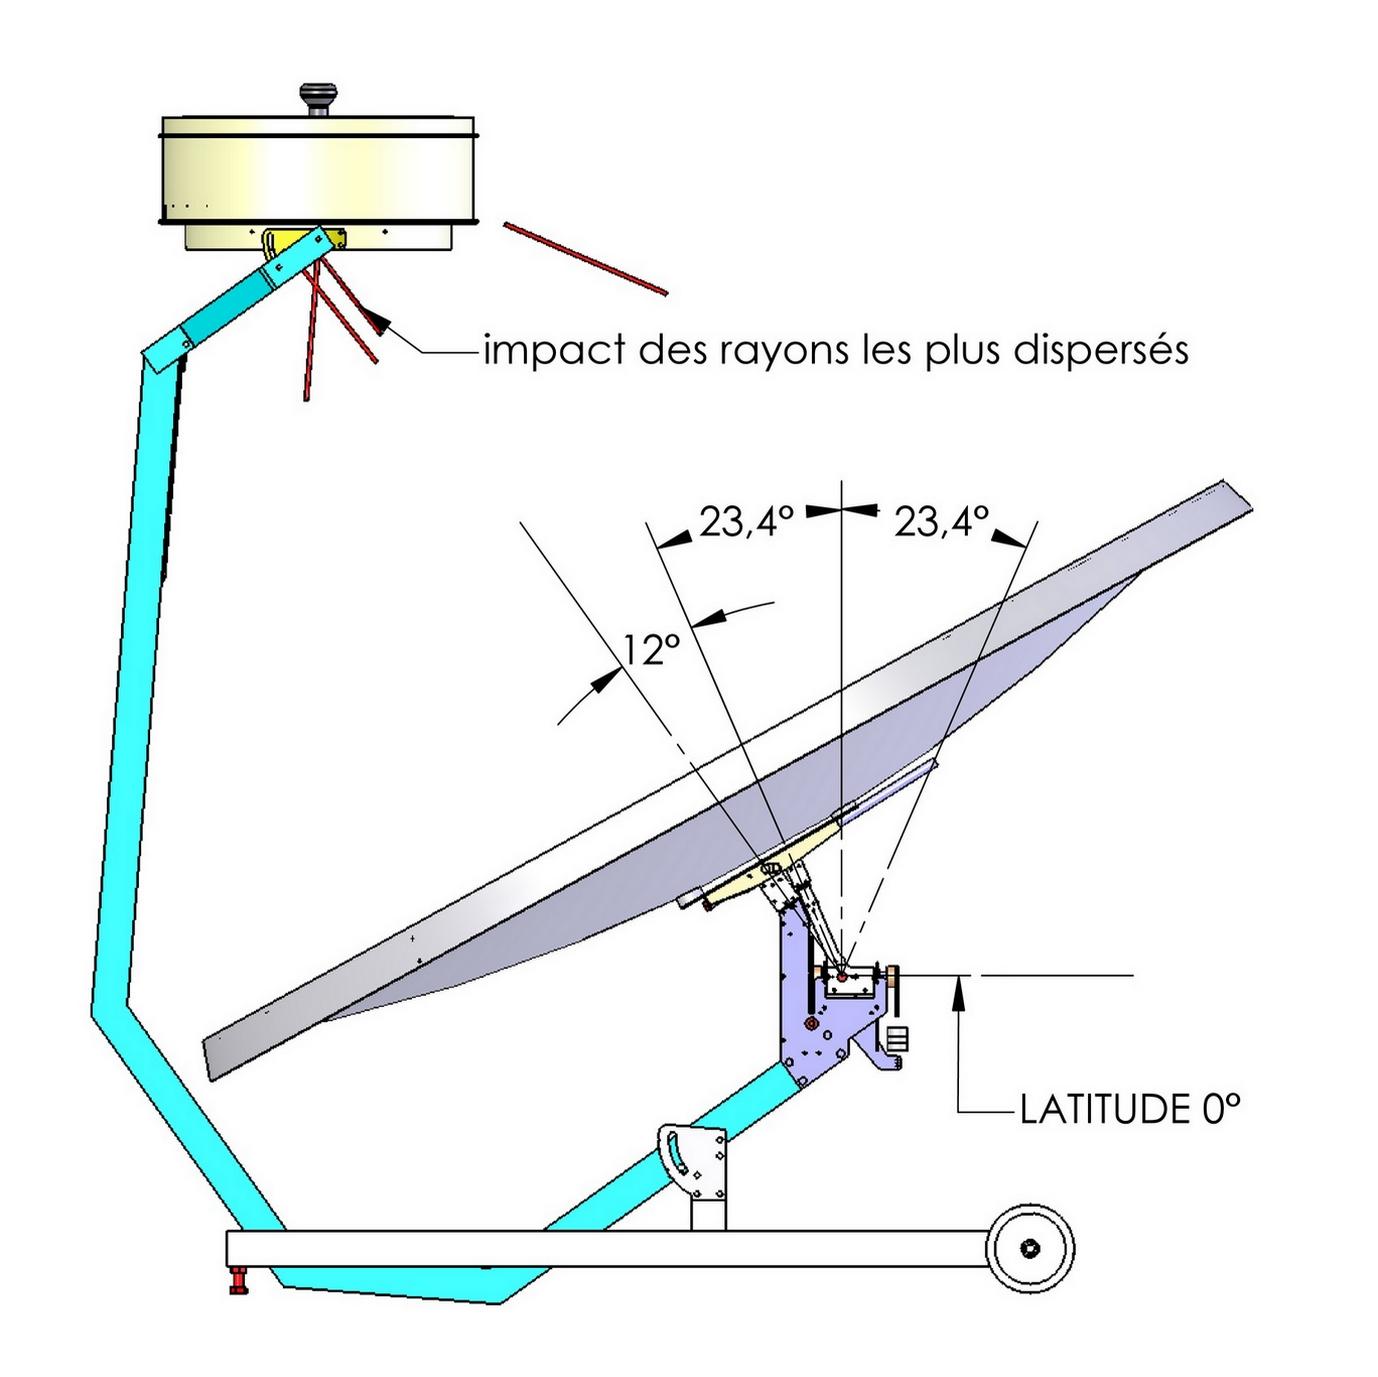 mécanisme triangle: latitude 0°, zénith, solstice été